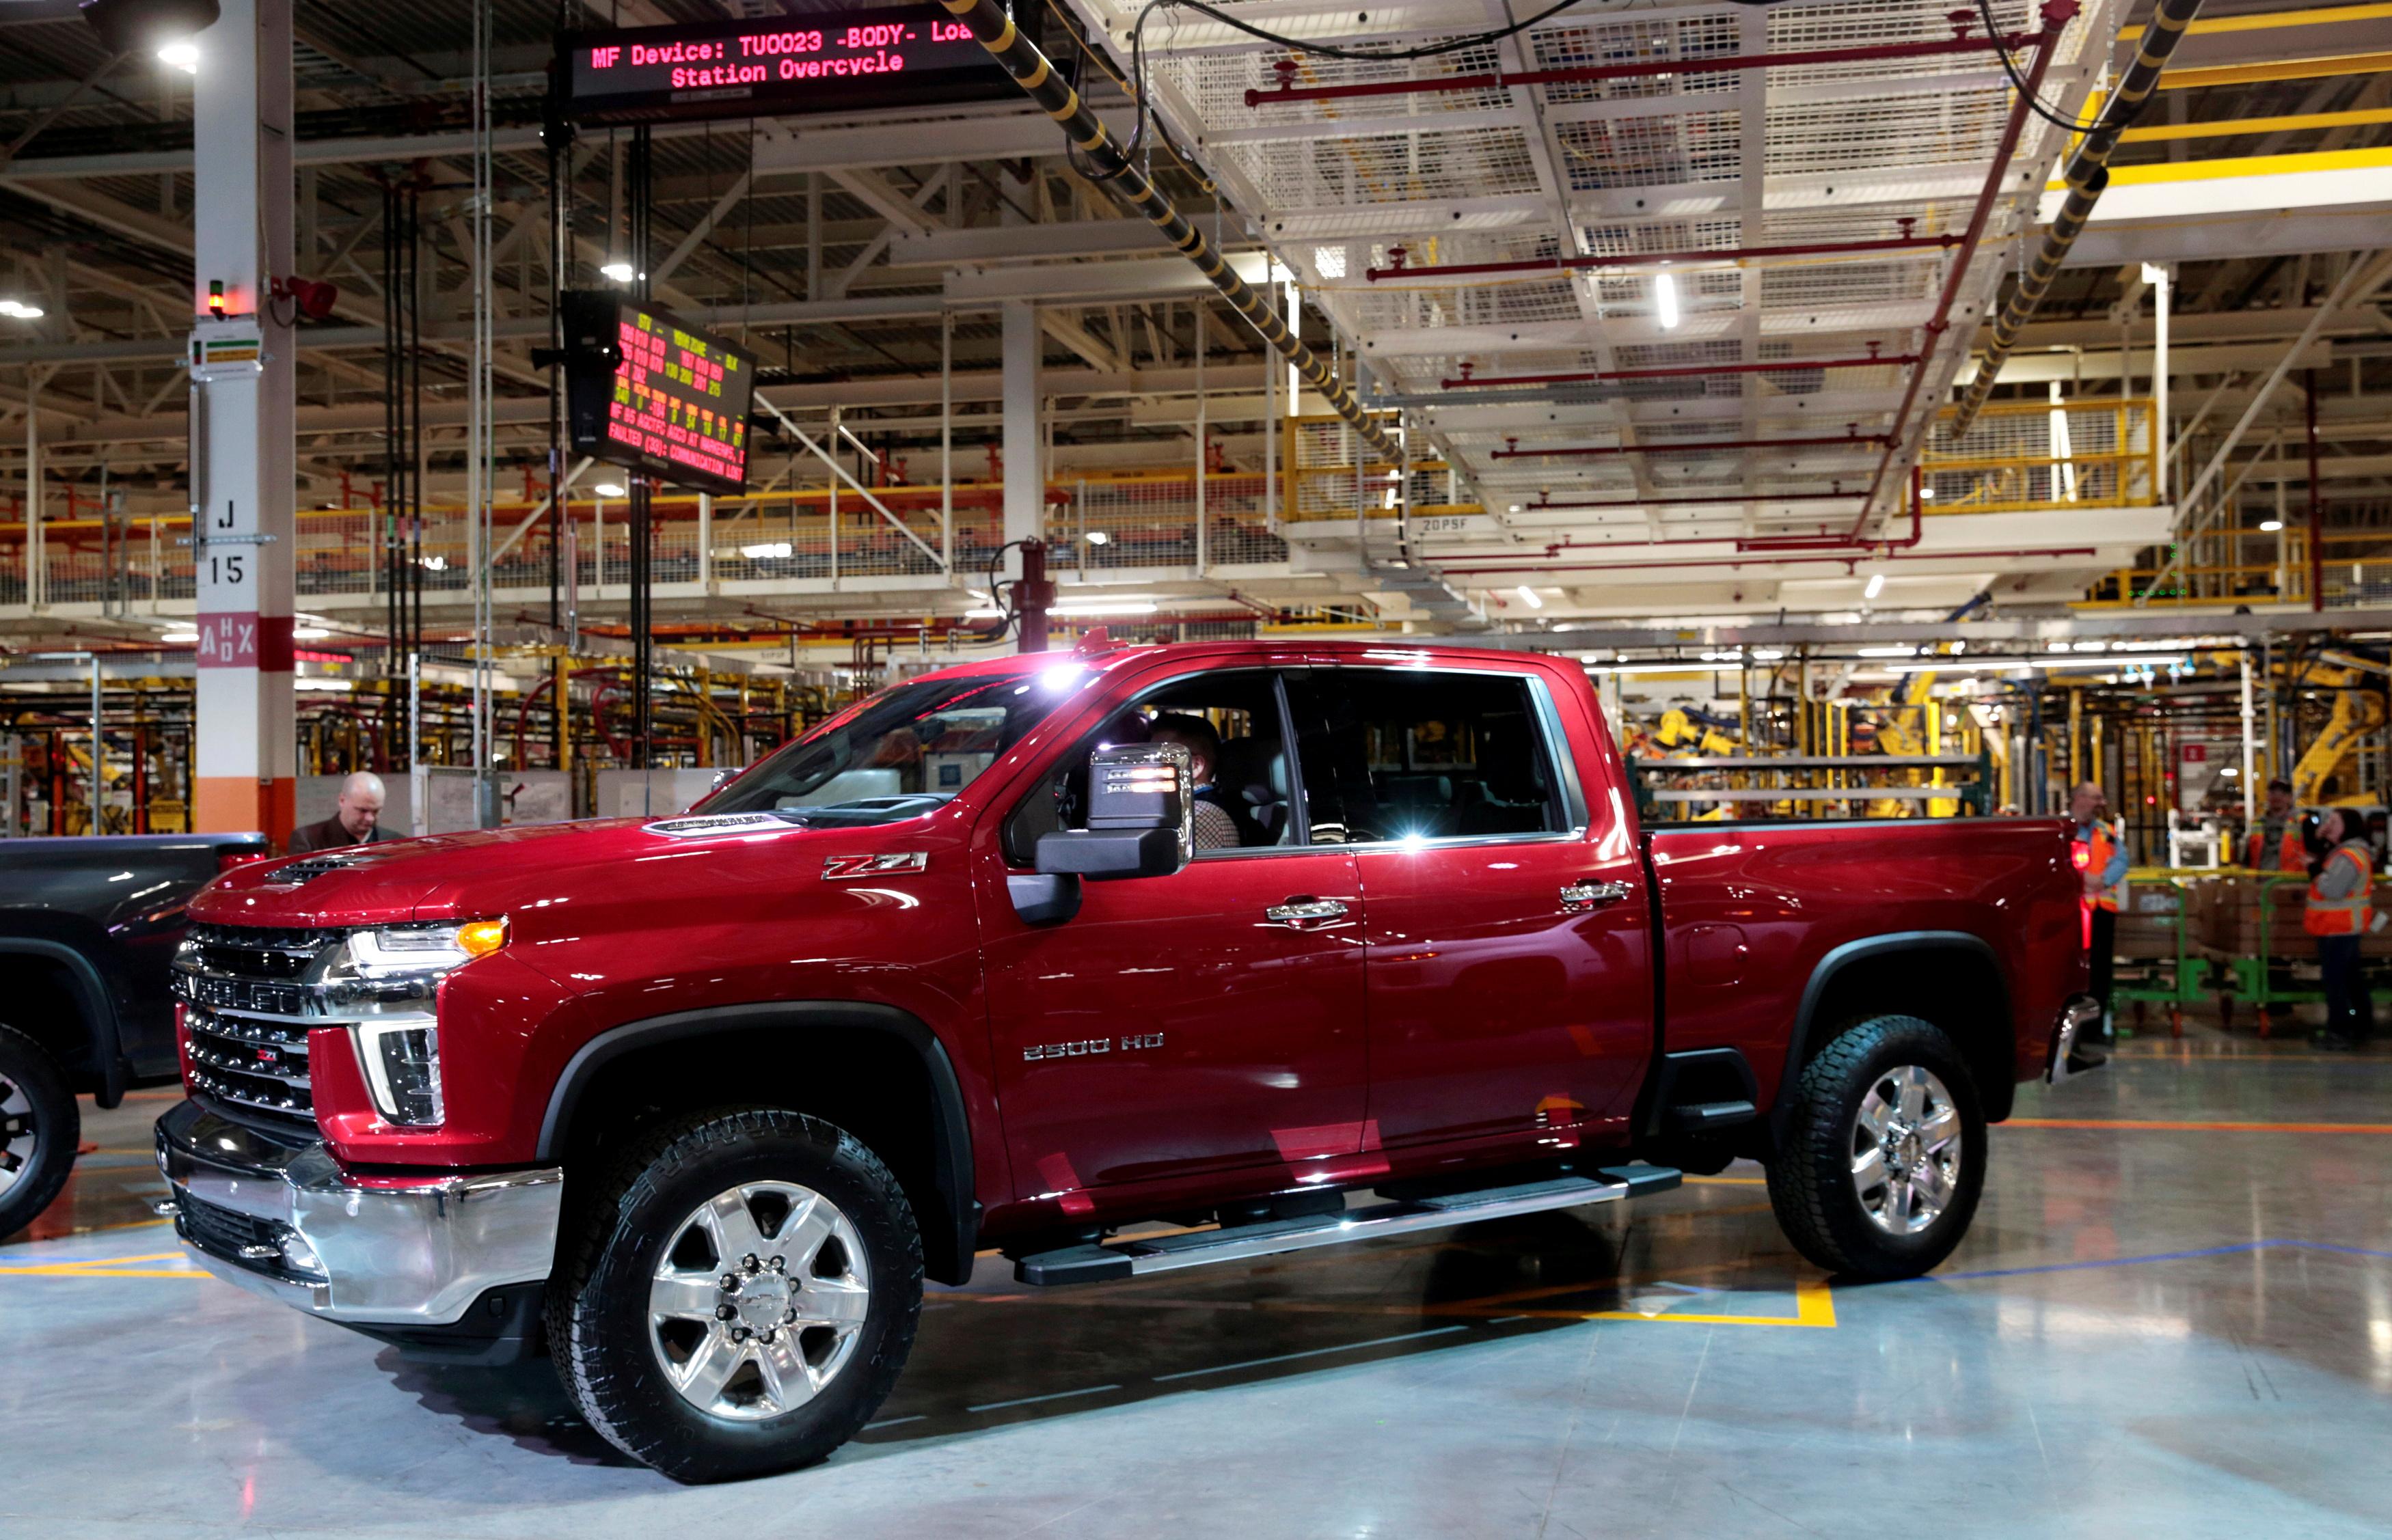 General Motors Co muestra la camioneta Chevrolet 2020 Silverado HD en la planta de ensamblaje de GM Flint en Flint, Michigan, EE. UU. El 5 de febrero de 2019. REUTERS / Rebecca Cook / Foto de archivo